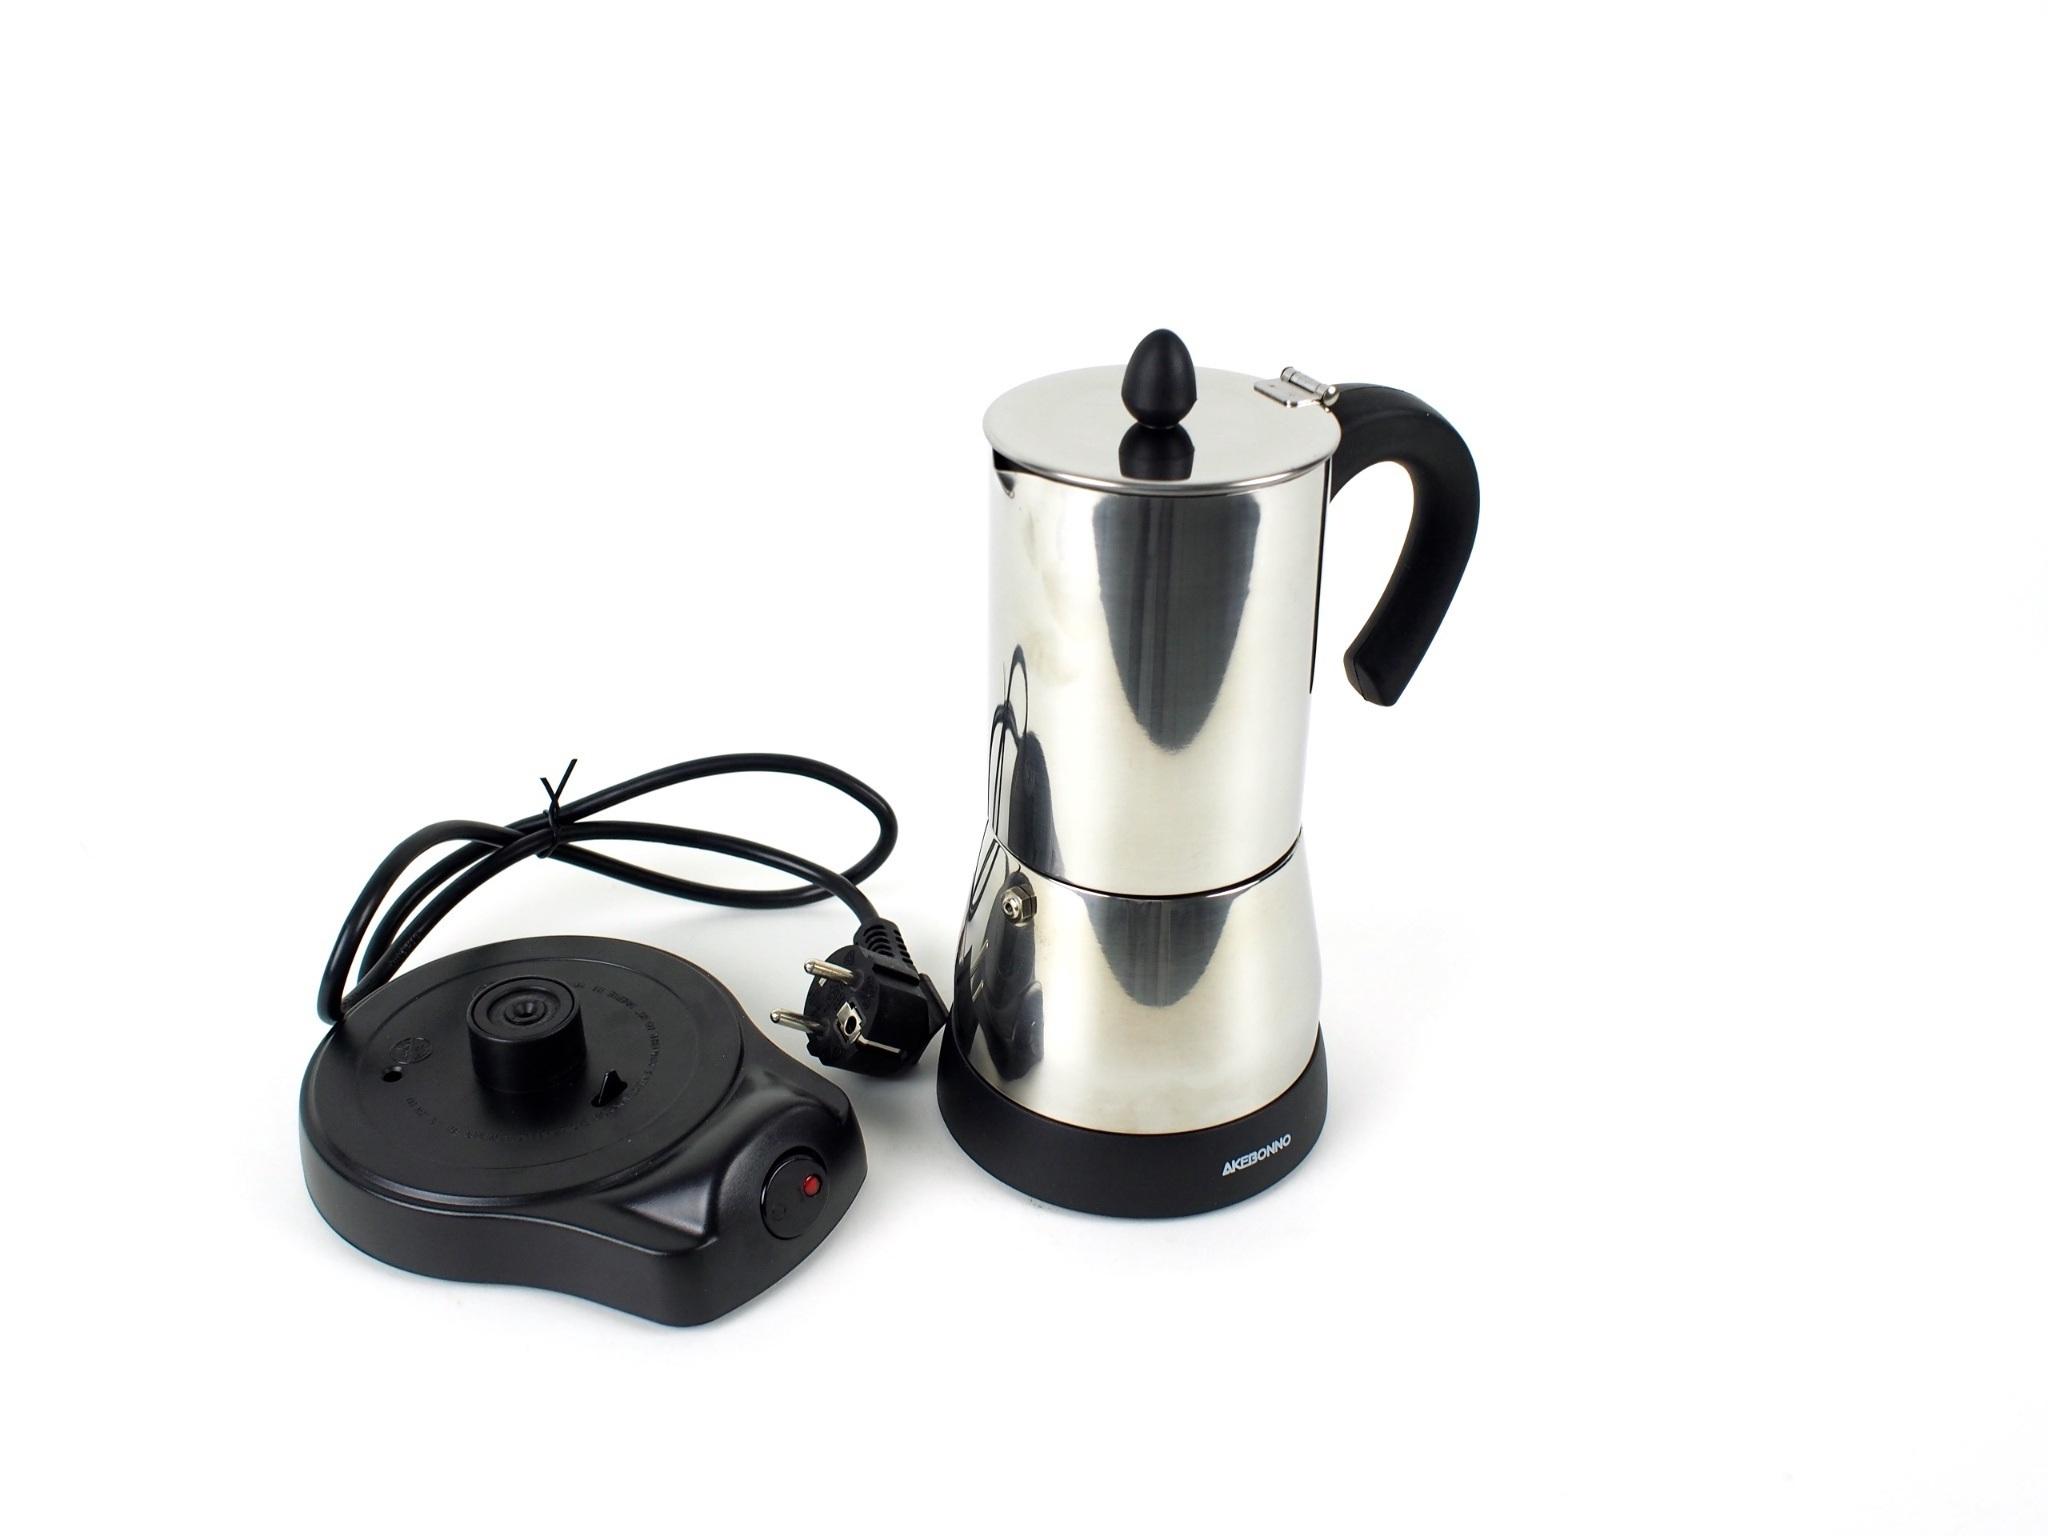 Jual Espresso Coffee Teko Kopi Akebonno Moka Pot Elektik Stainless 4 Maker Cup Tonchel Shop Tokopedia